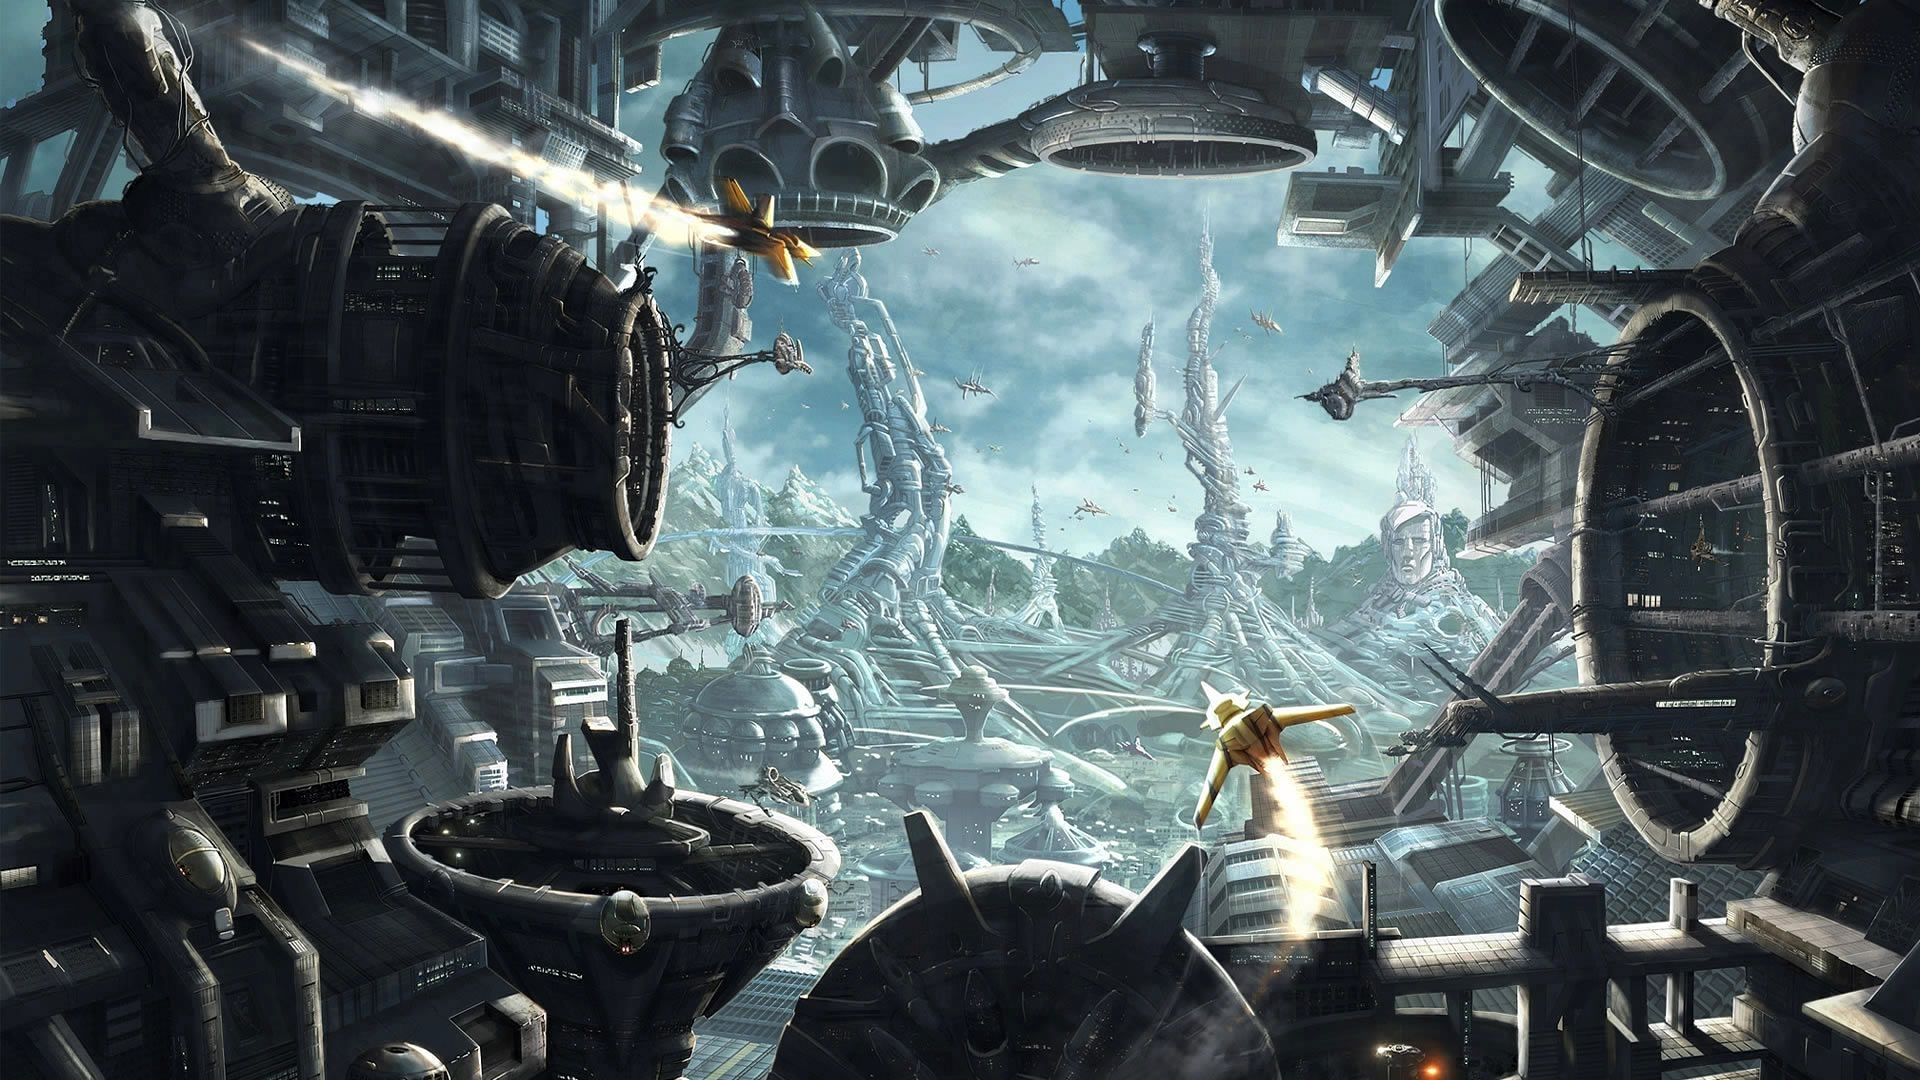 sci-fi spacecraft art | sci-fi wallpaper of the week #9 | fantasy